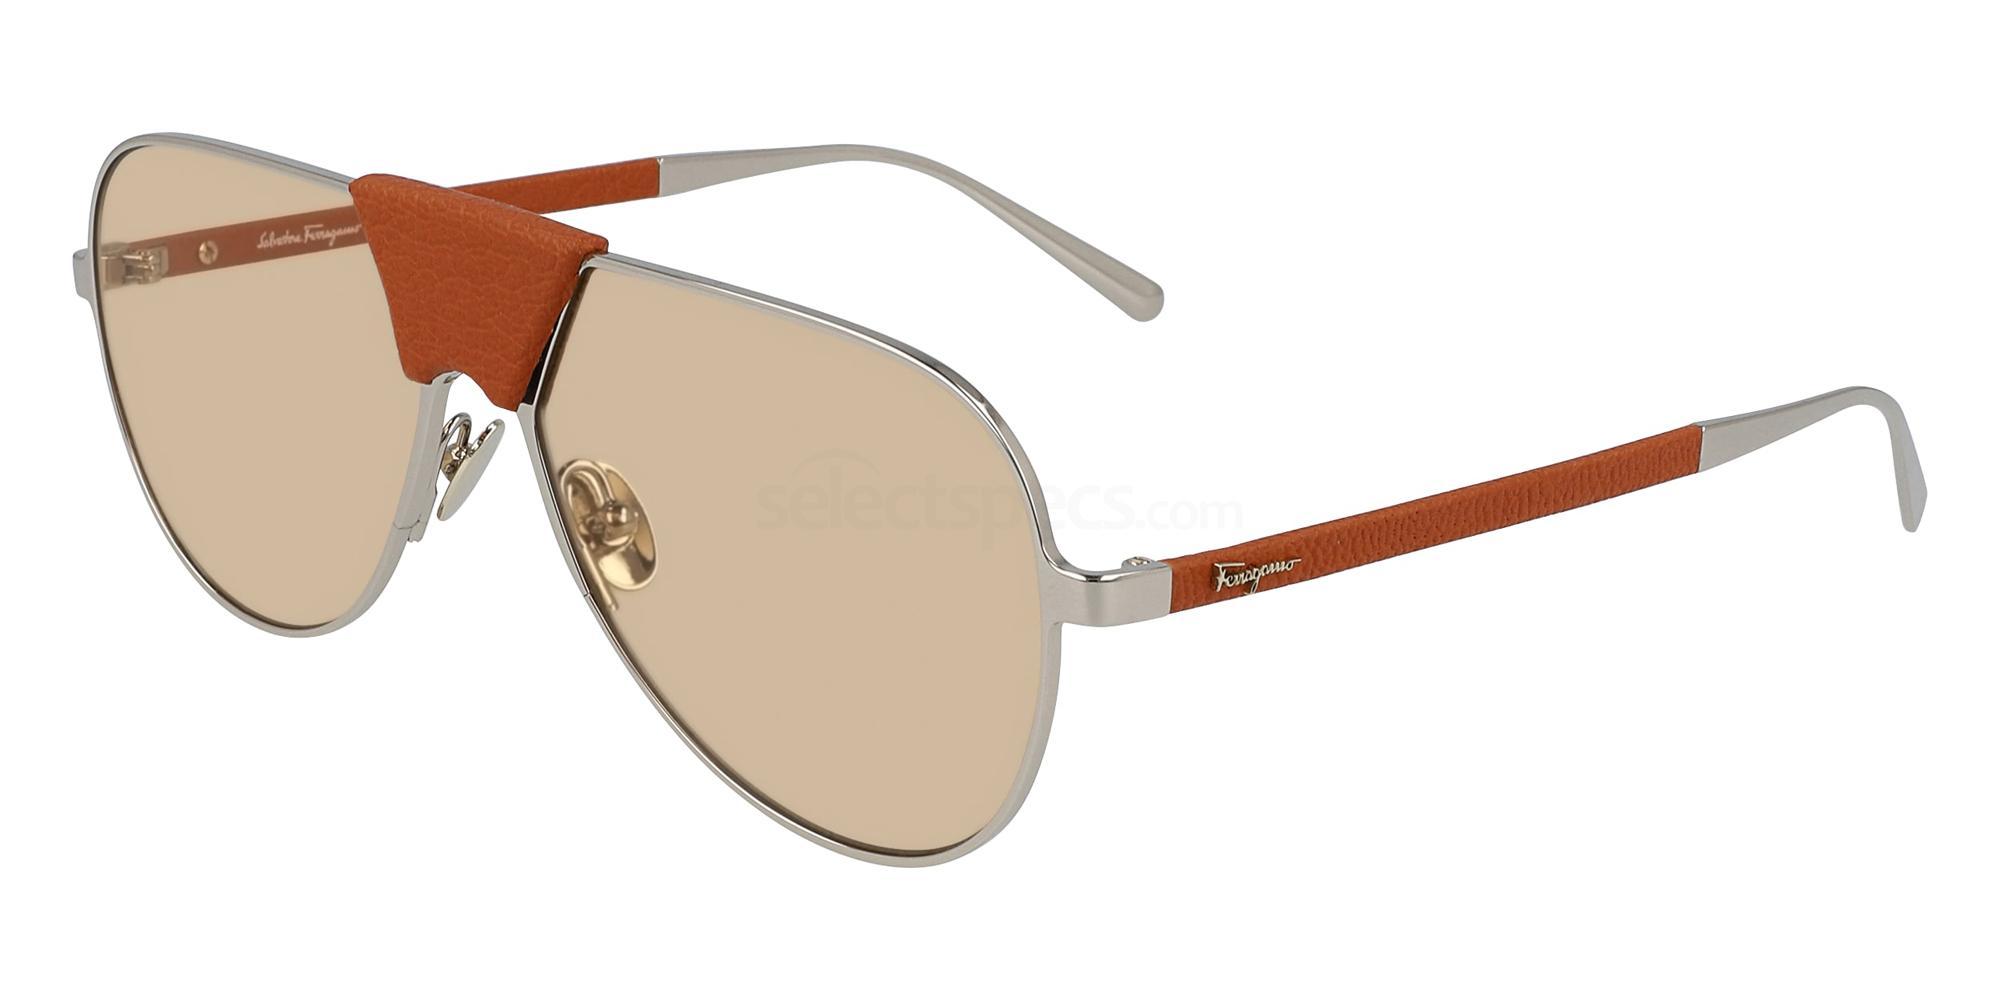 Salvatore Ferragamo sunglasses most popular valentines gifts for men